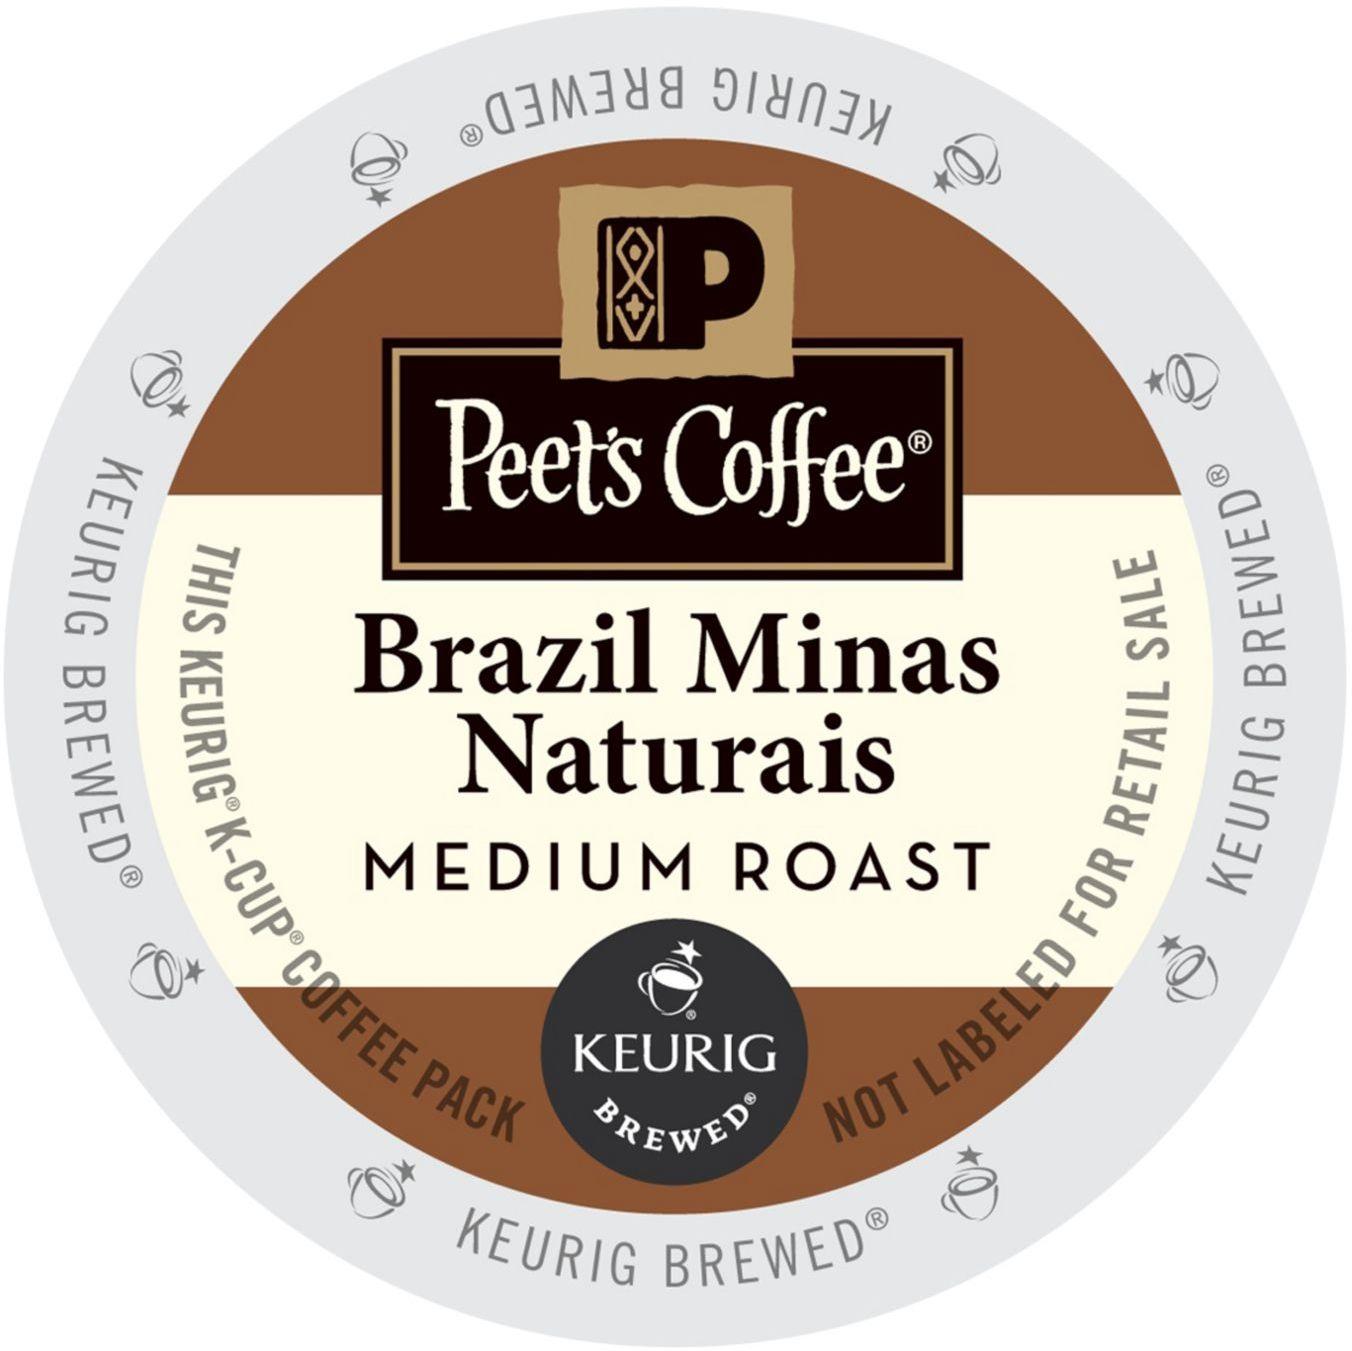 Peet's Coffee & Tea Brazil Minas Naturais Coffee 22 K Cup Packs